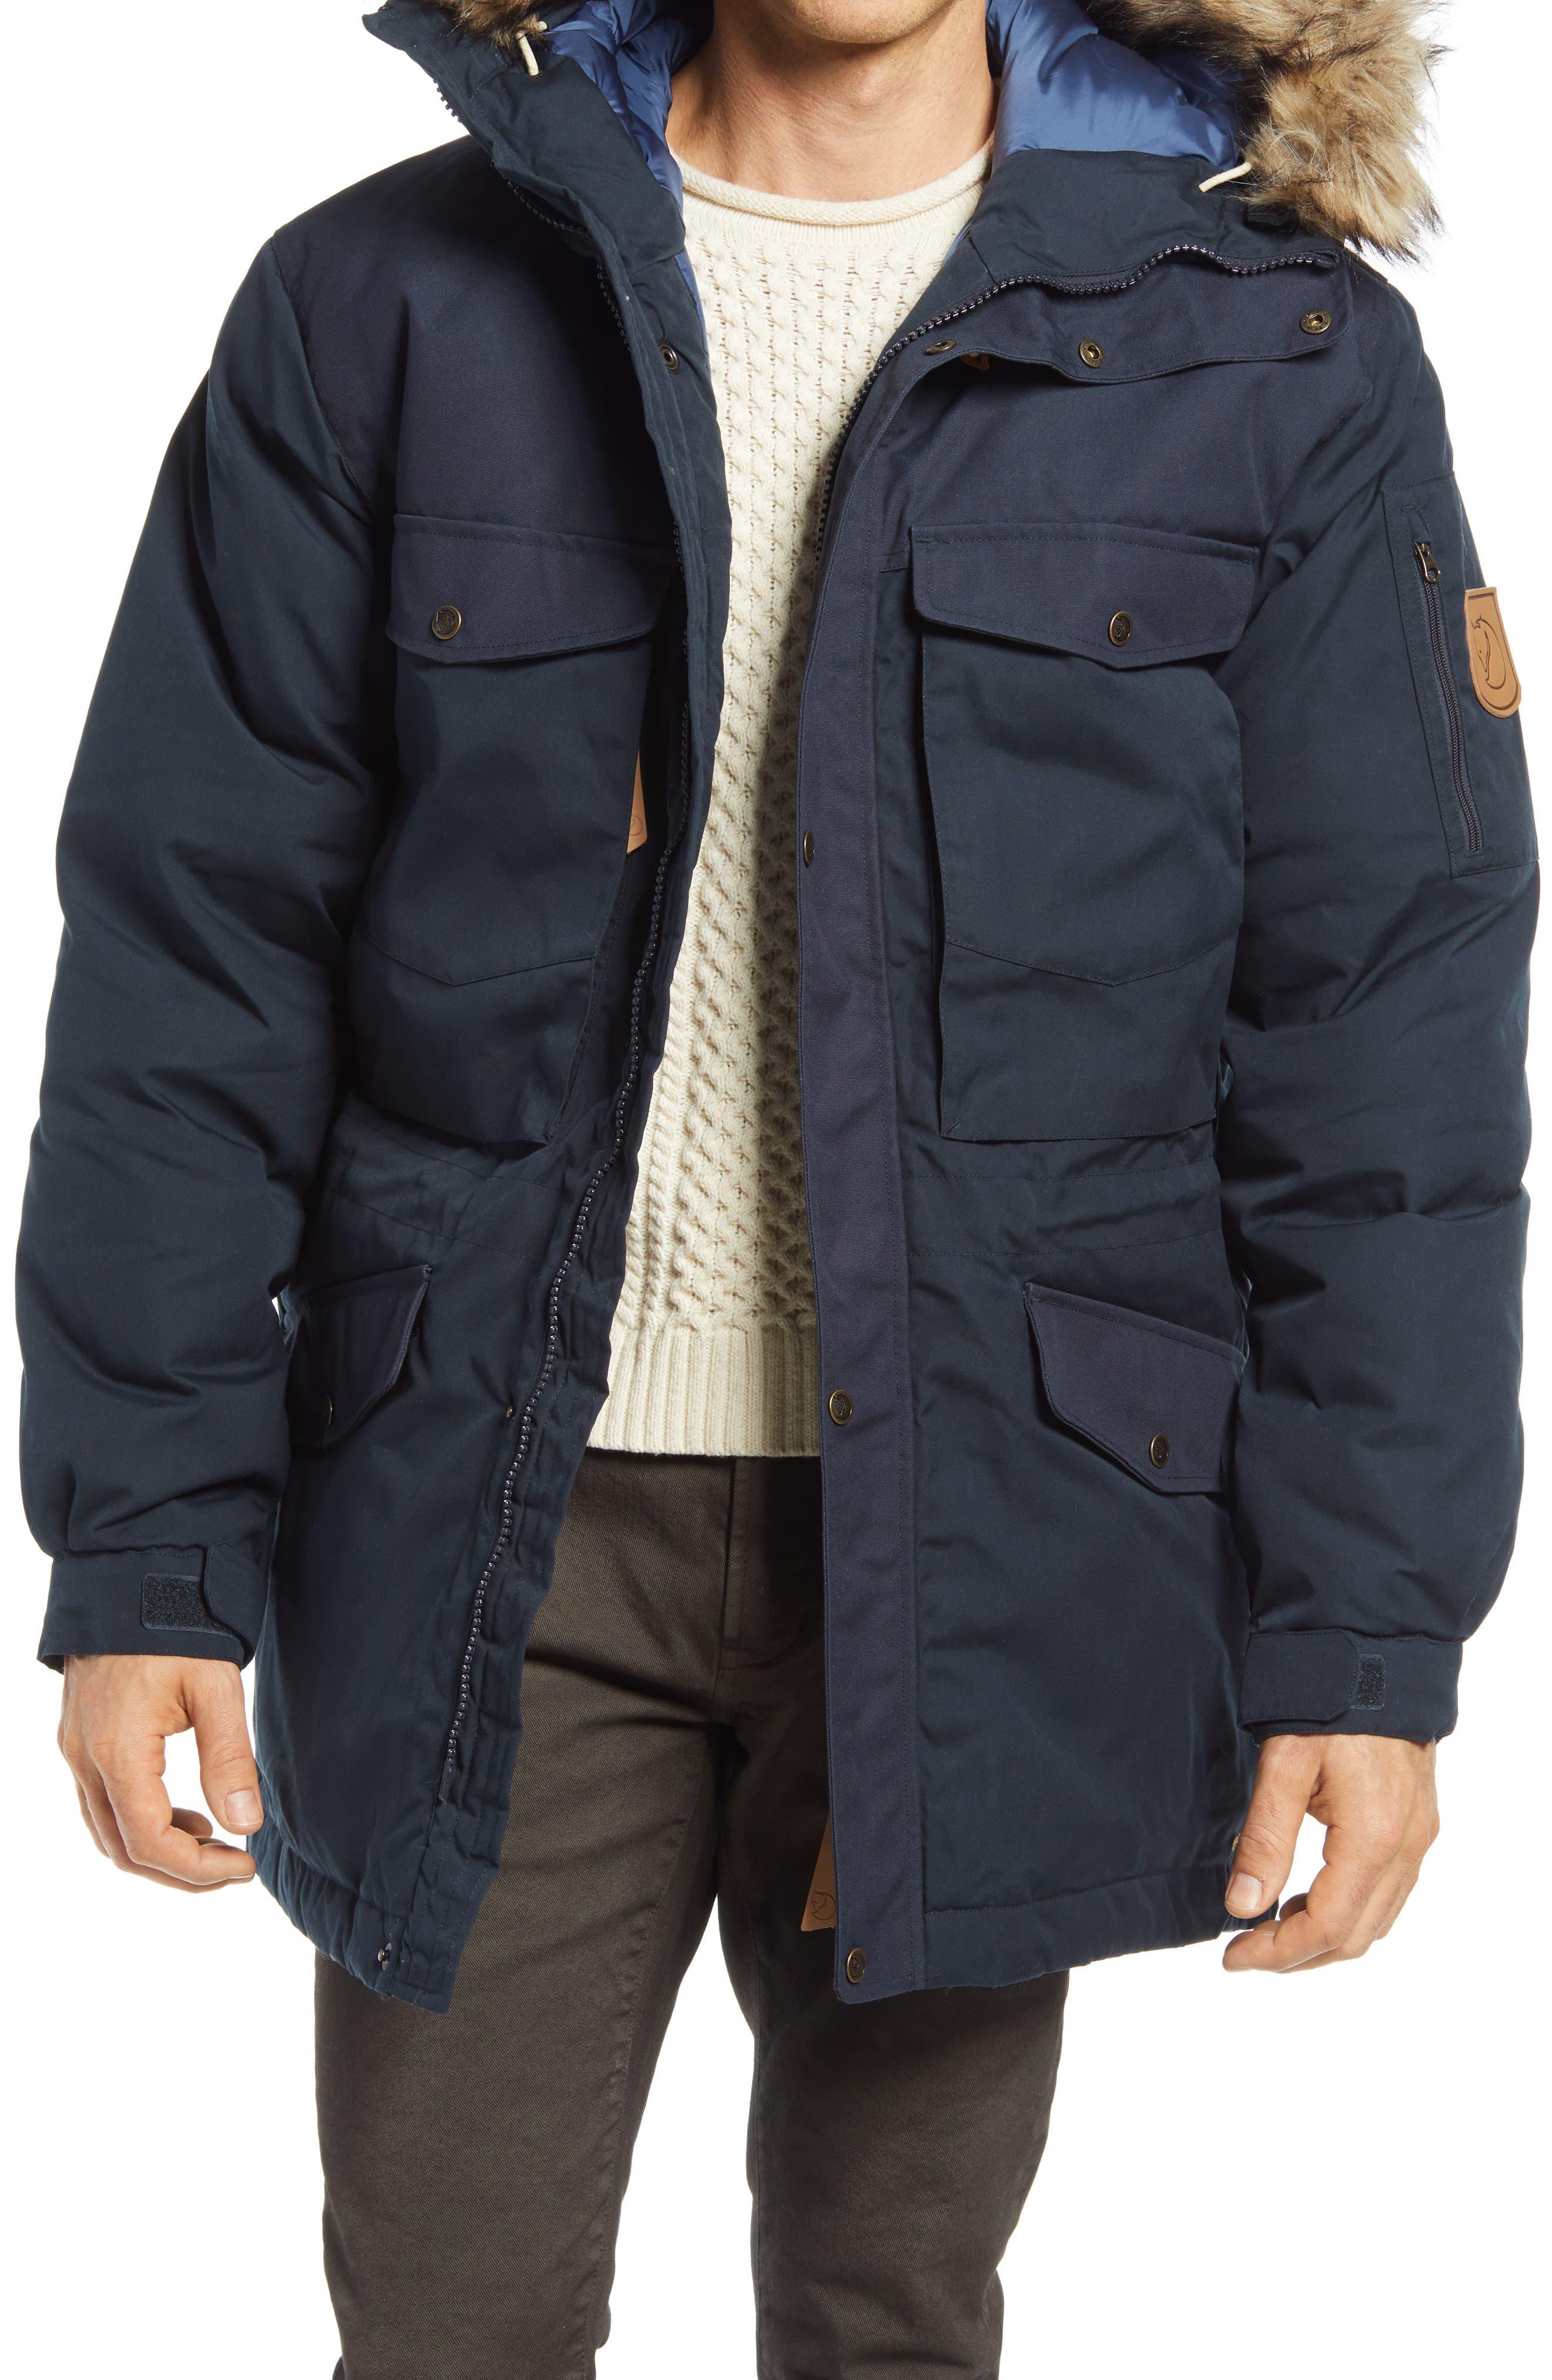 Singi Down Jacket With Faux Fur Trim